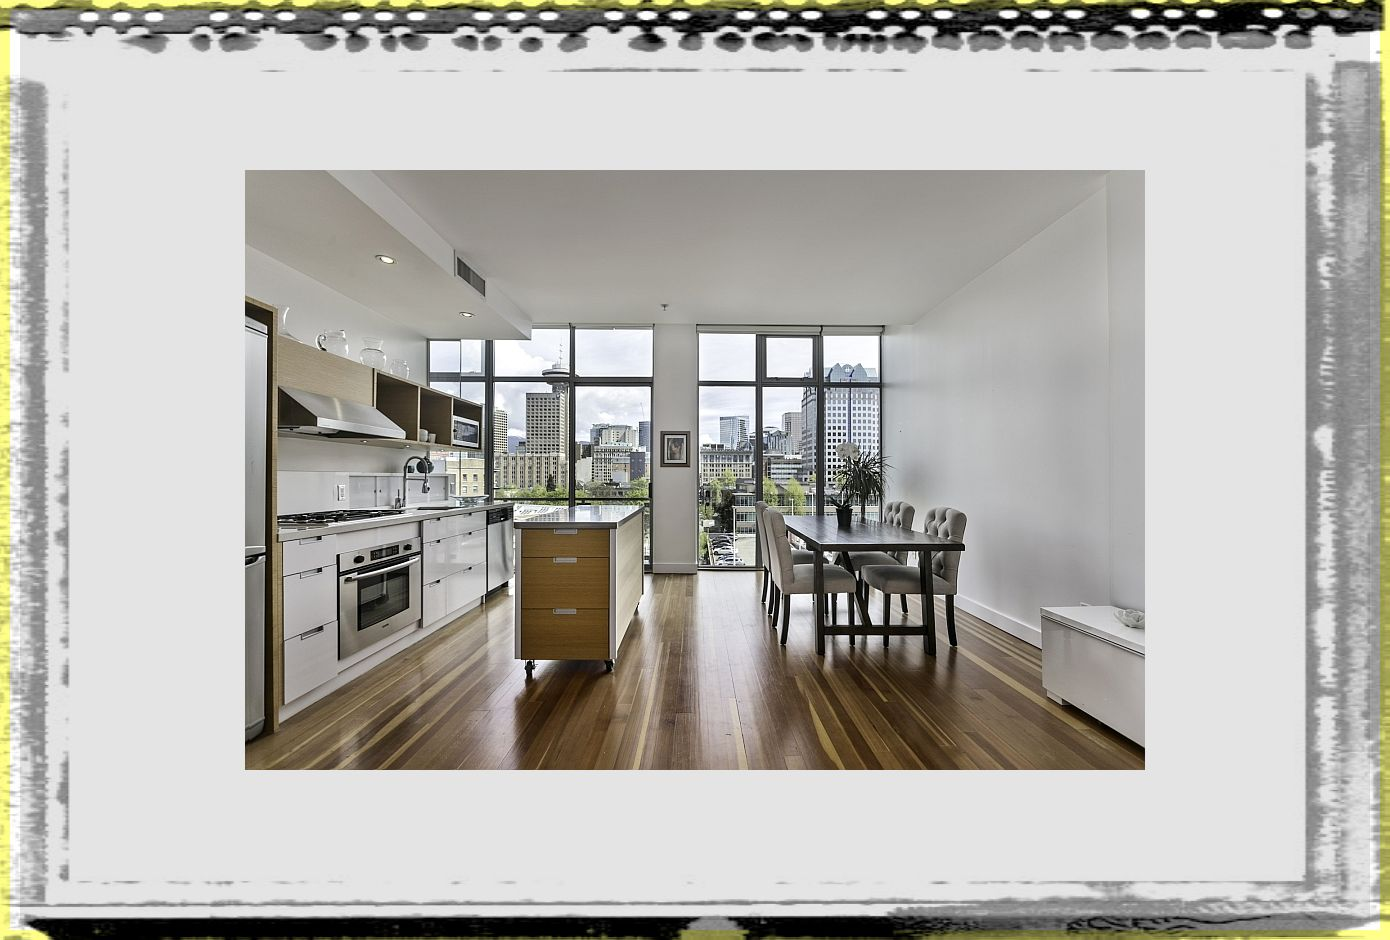 Mobile kitchen island inside loft Style Apartment In Vancouver apartment kitchen islands